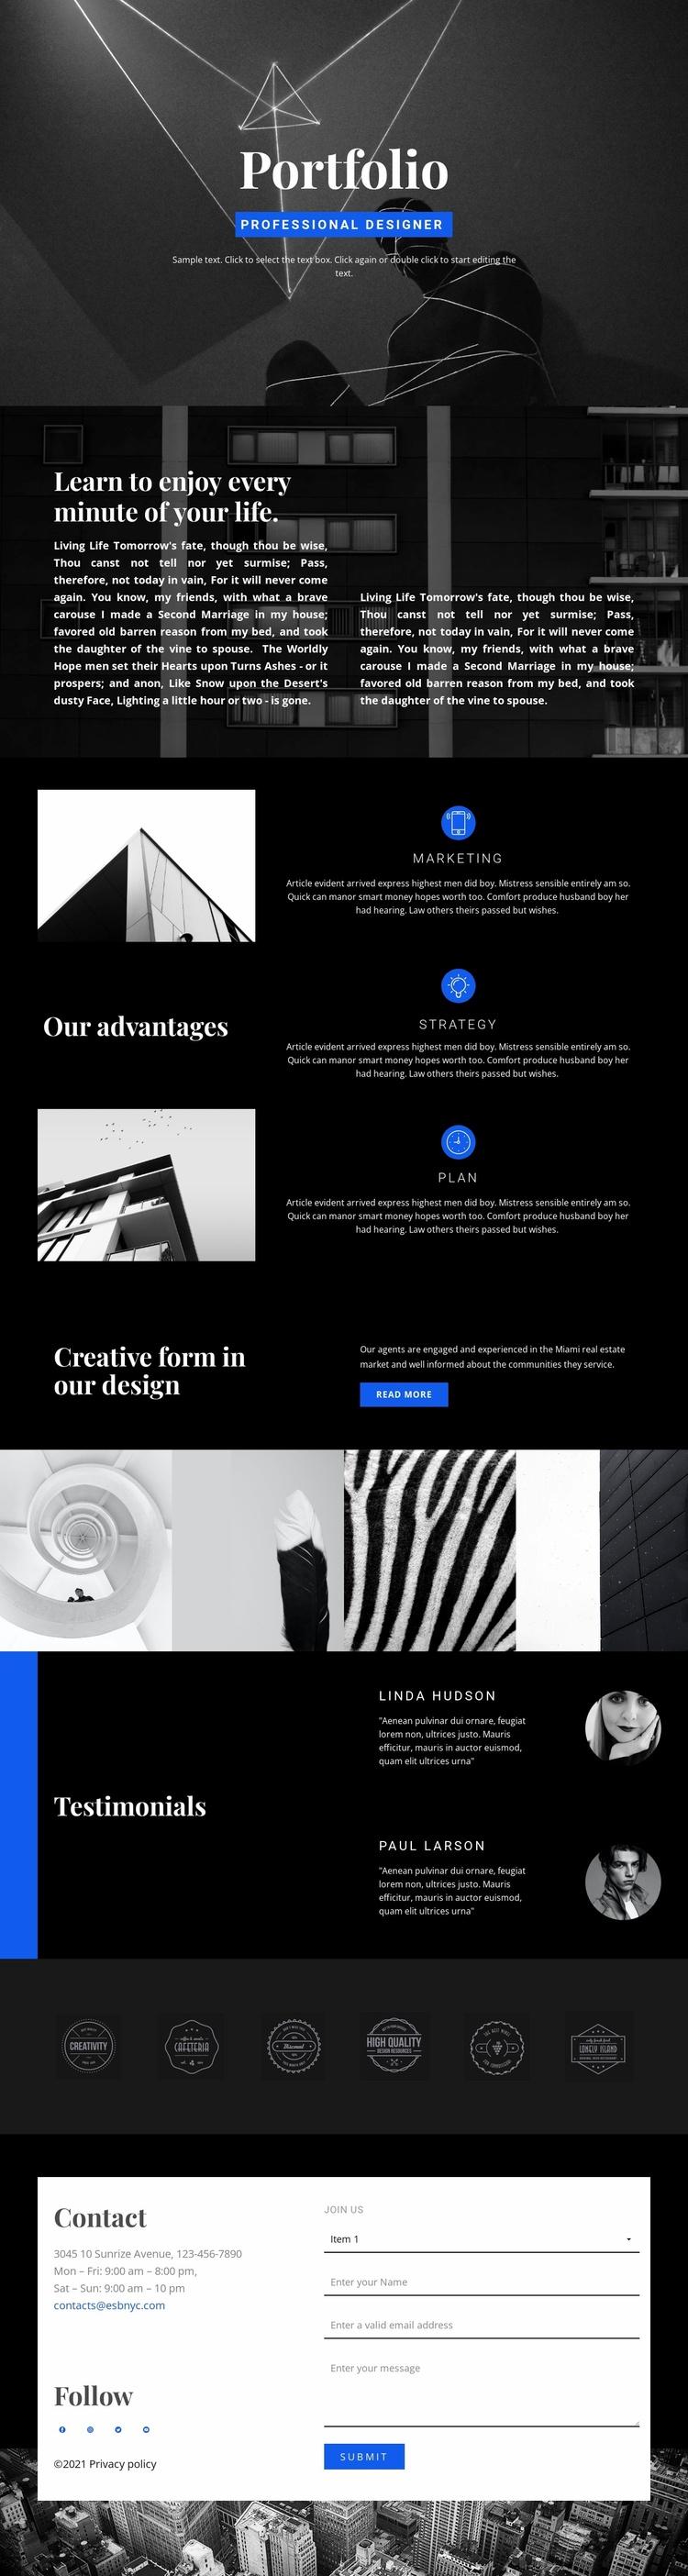 Fashion Designer Portfolio Website Template